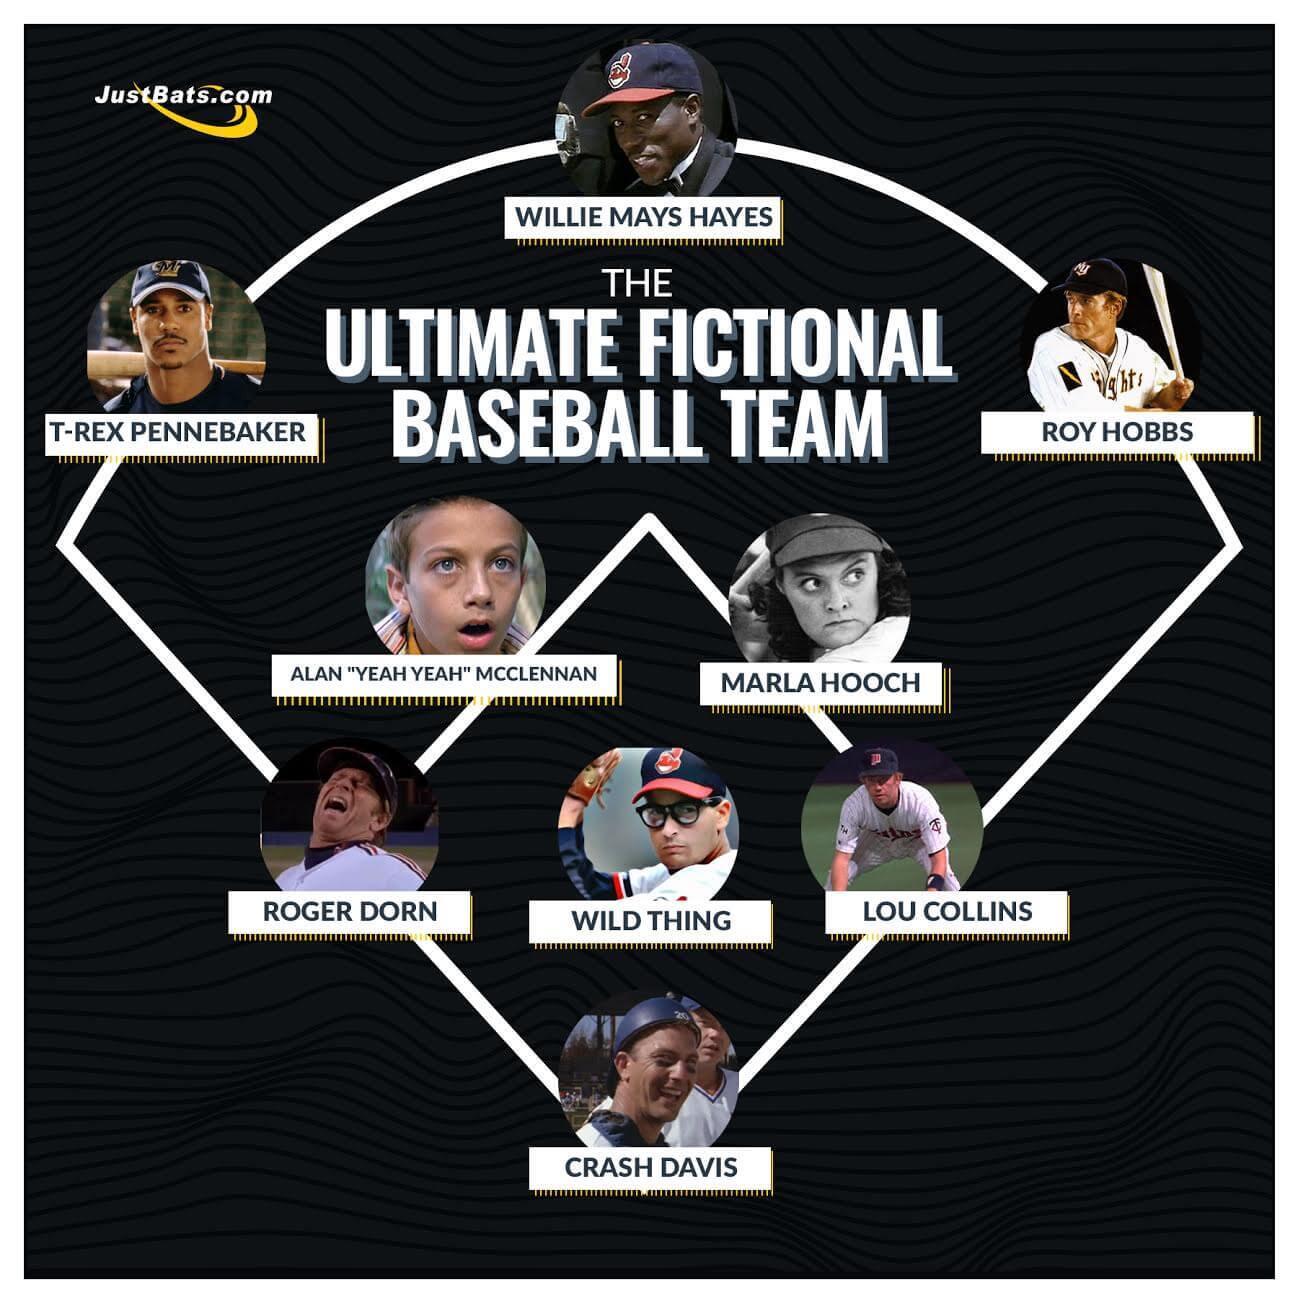 The Ultimate Fictional Baseball Team